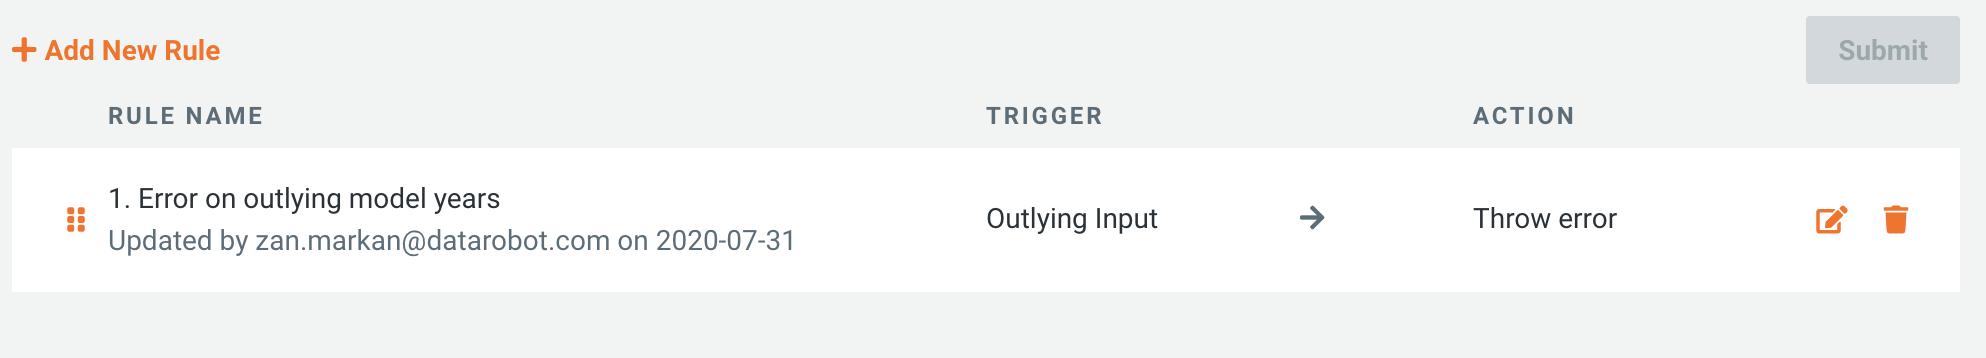 Outlying input trigger set